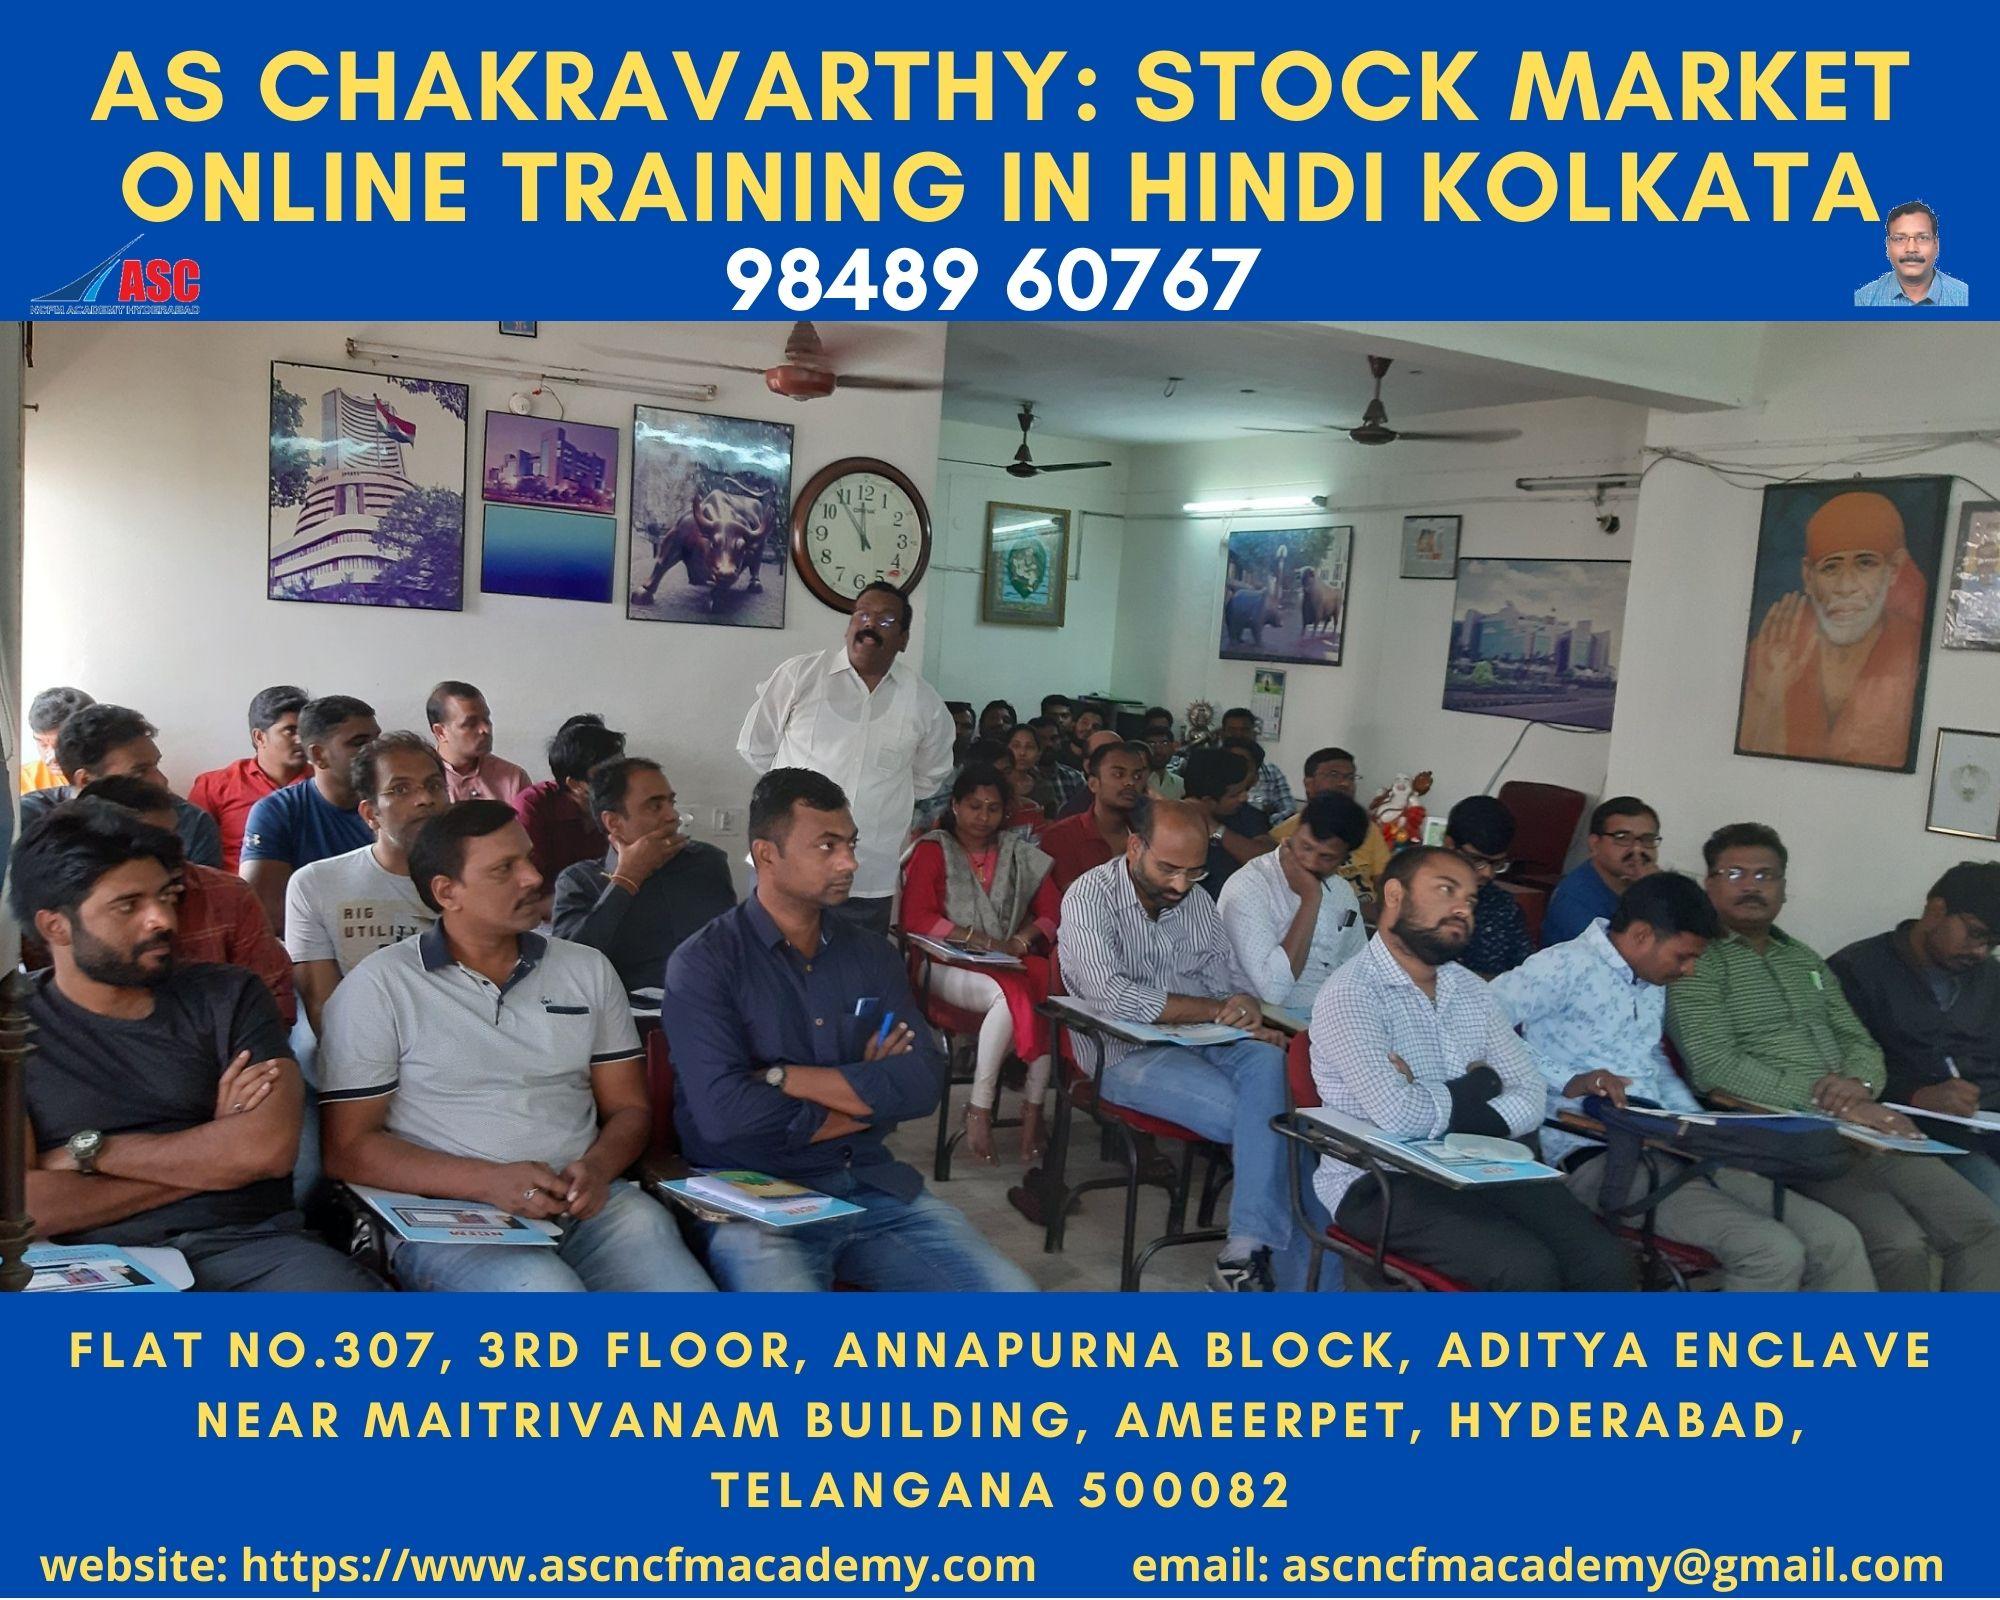 Online Stock Market Technical Training in Hindi Kolkata